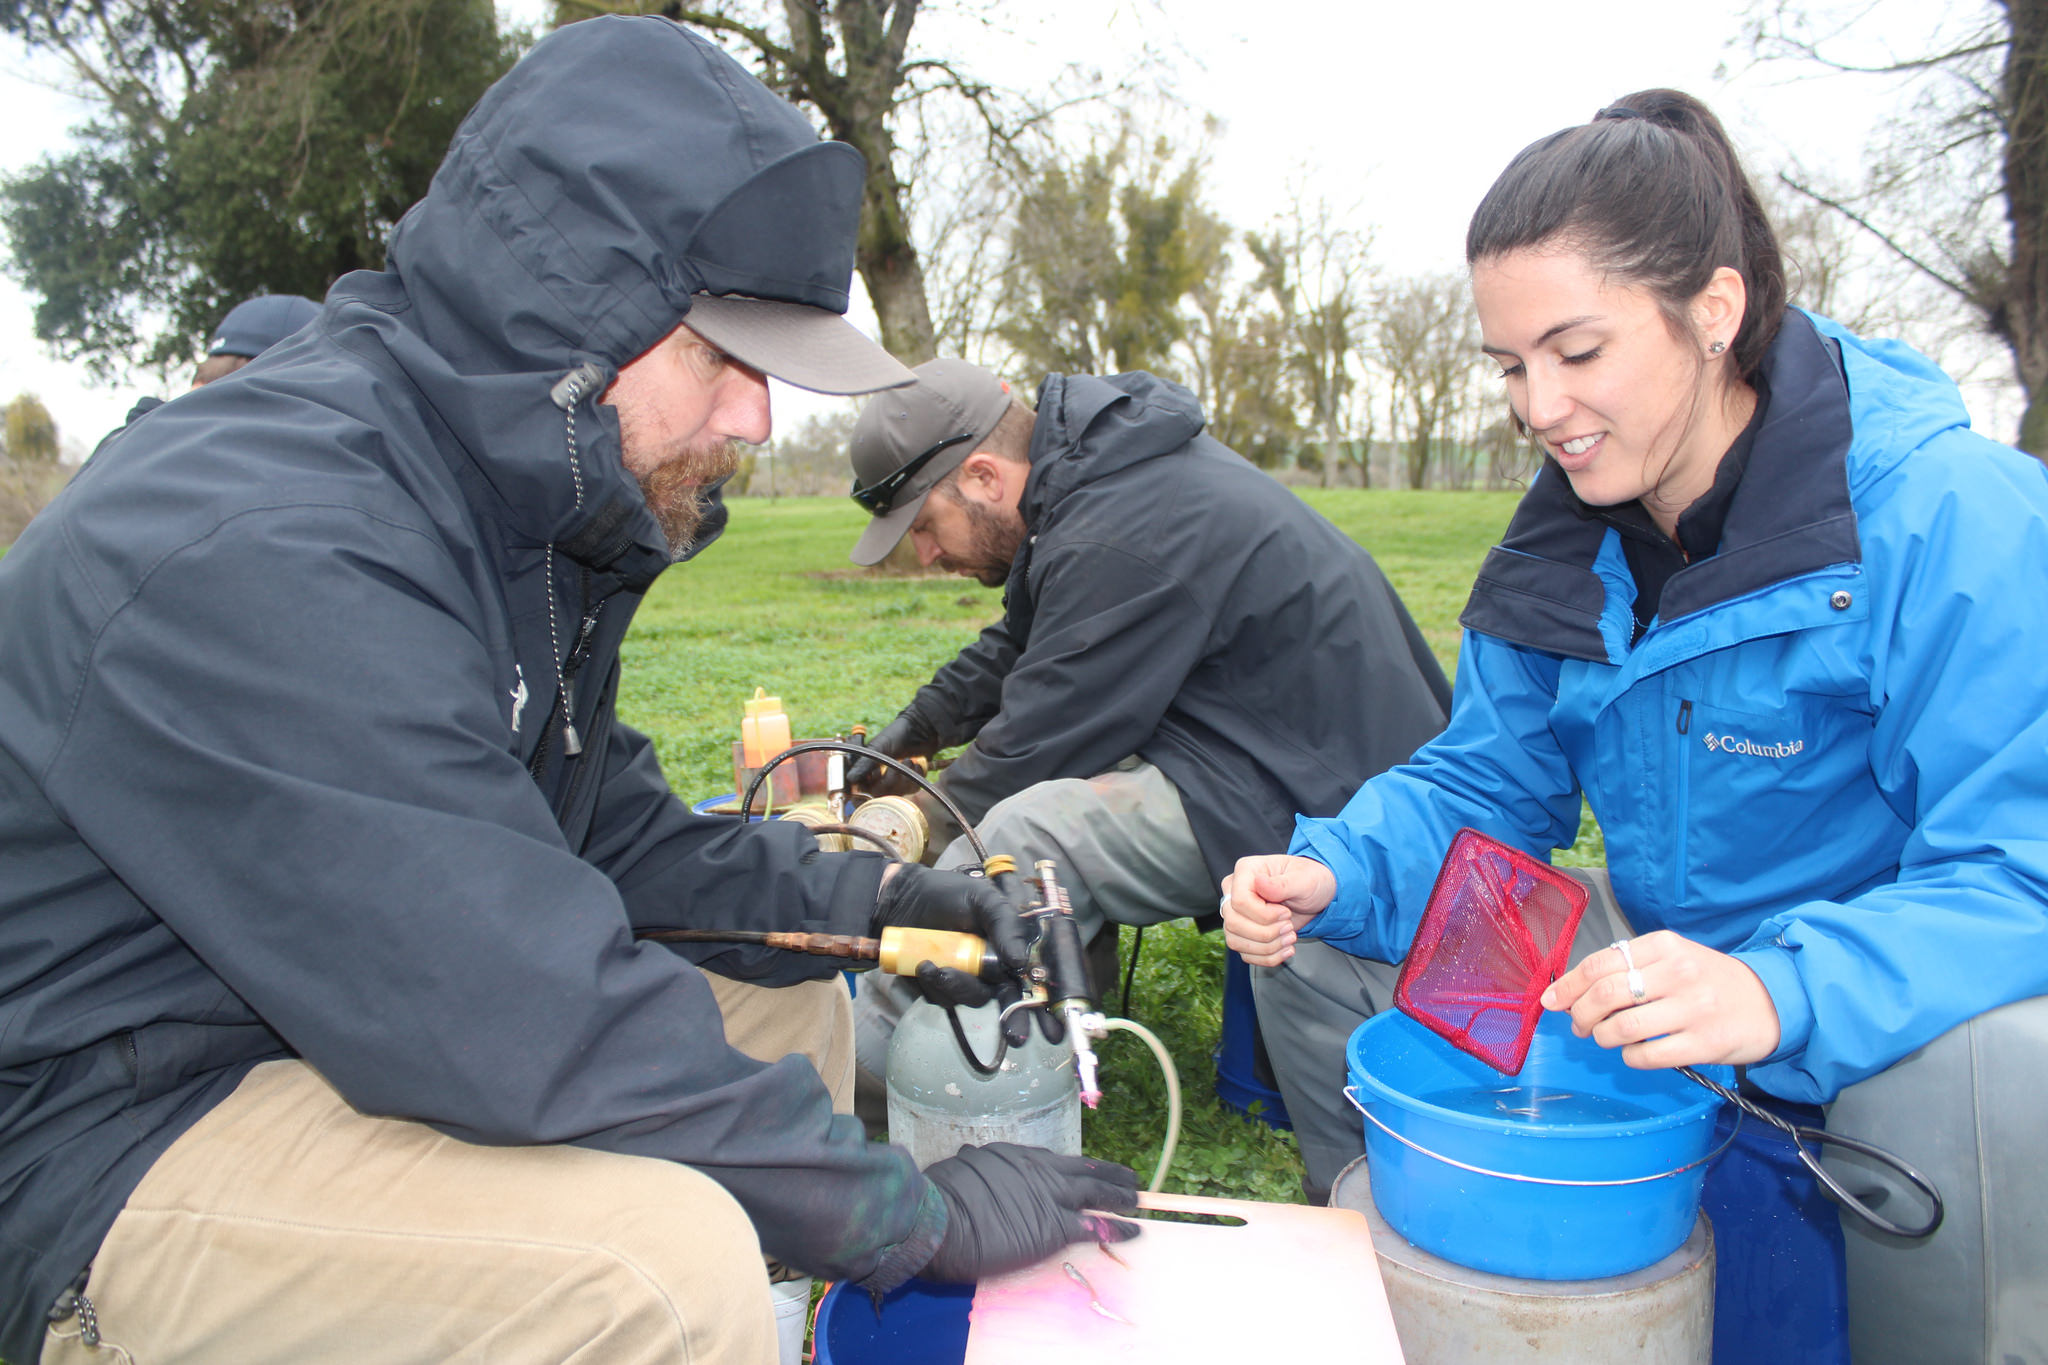 salmon marking team